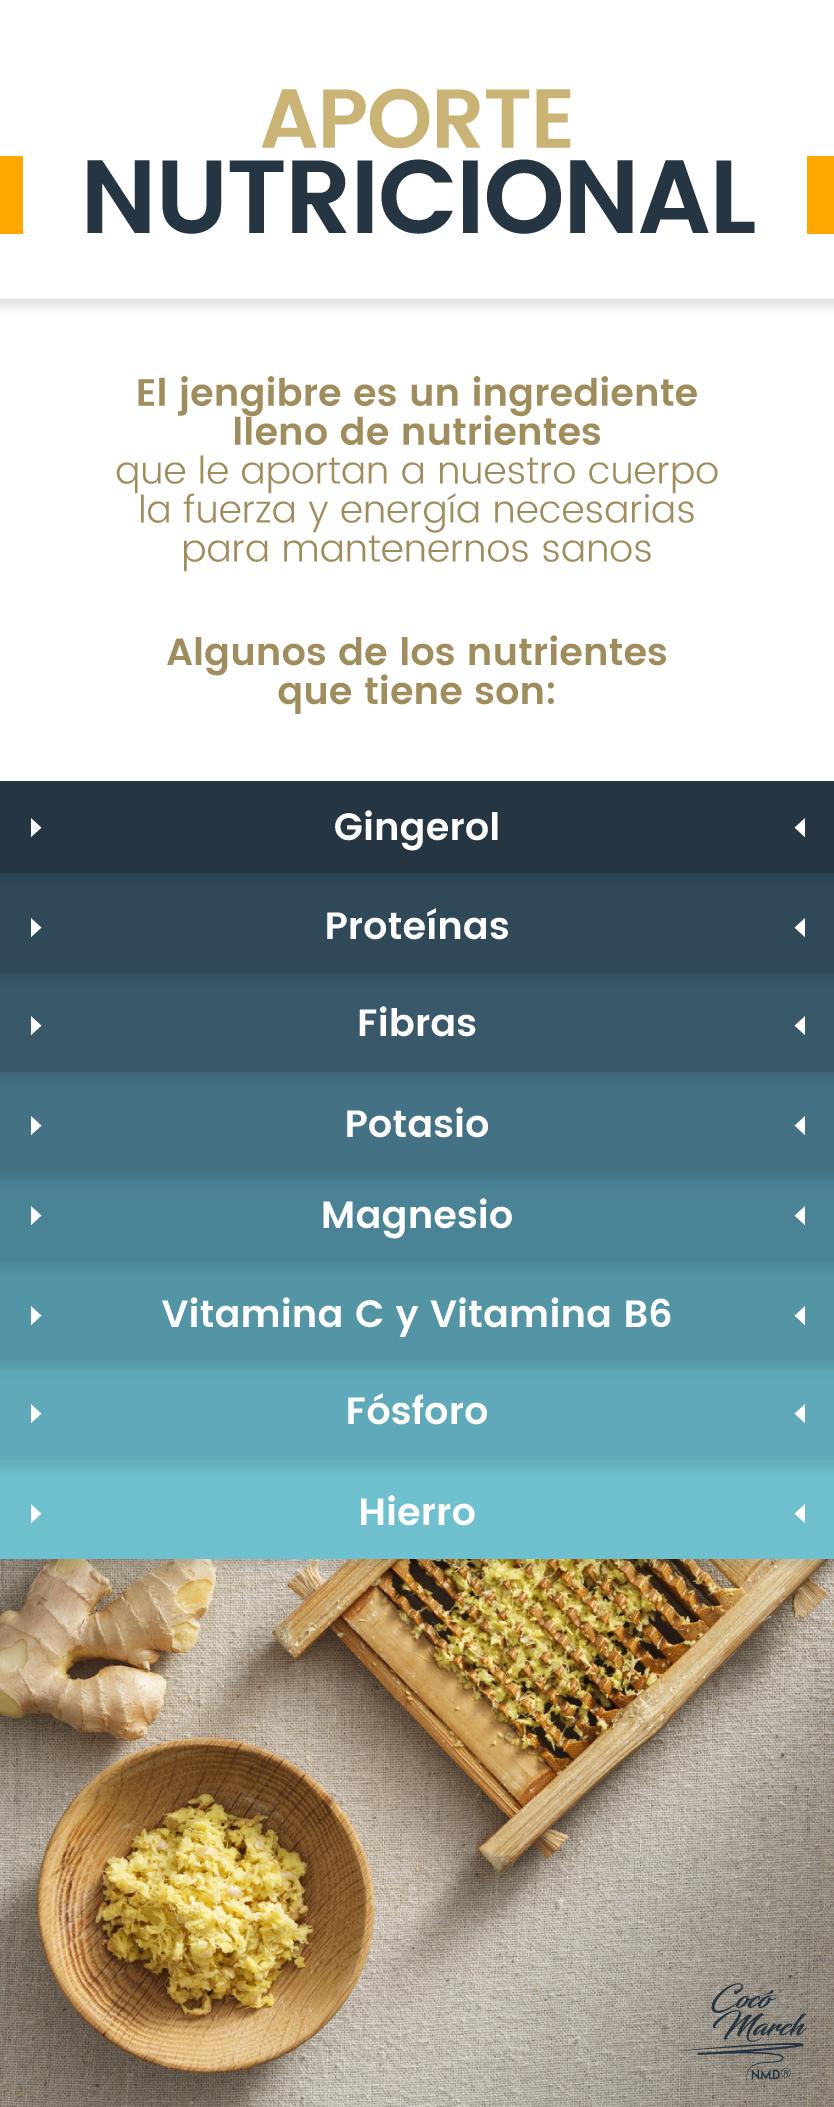 aporte-nutricional-del-jengibre